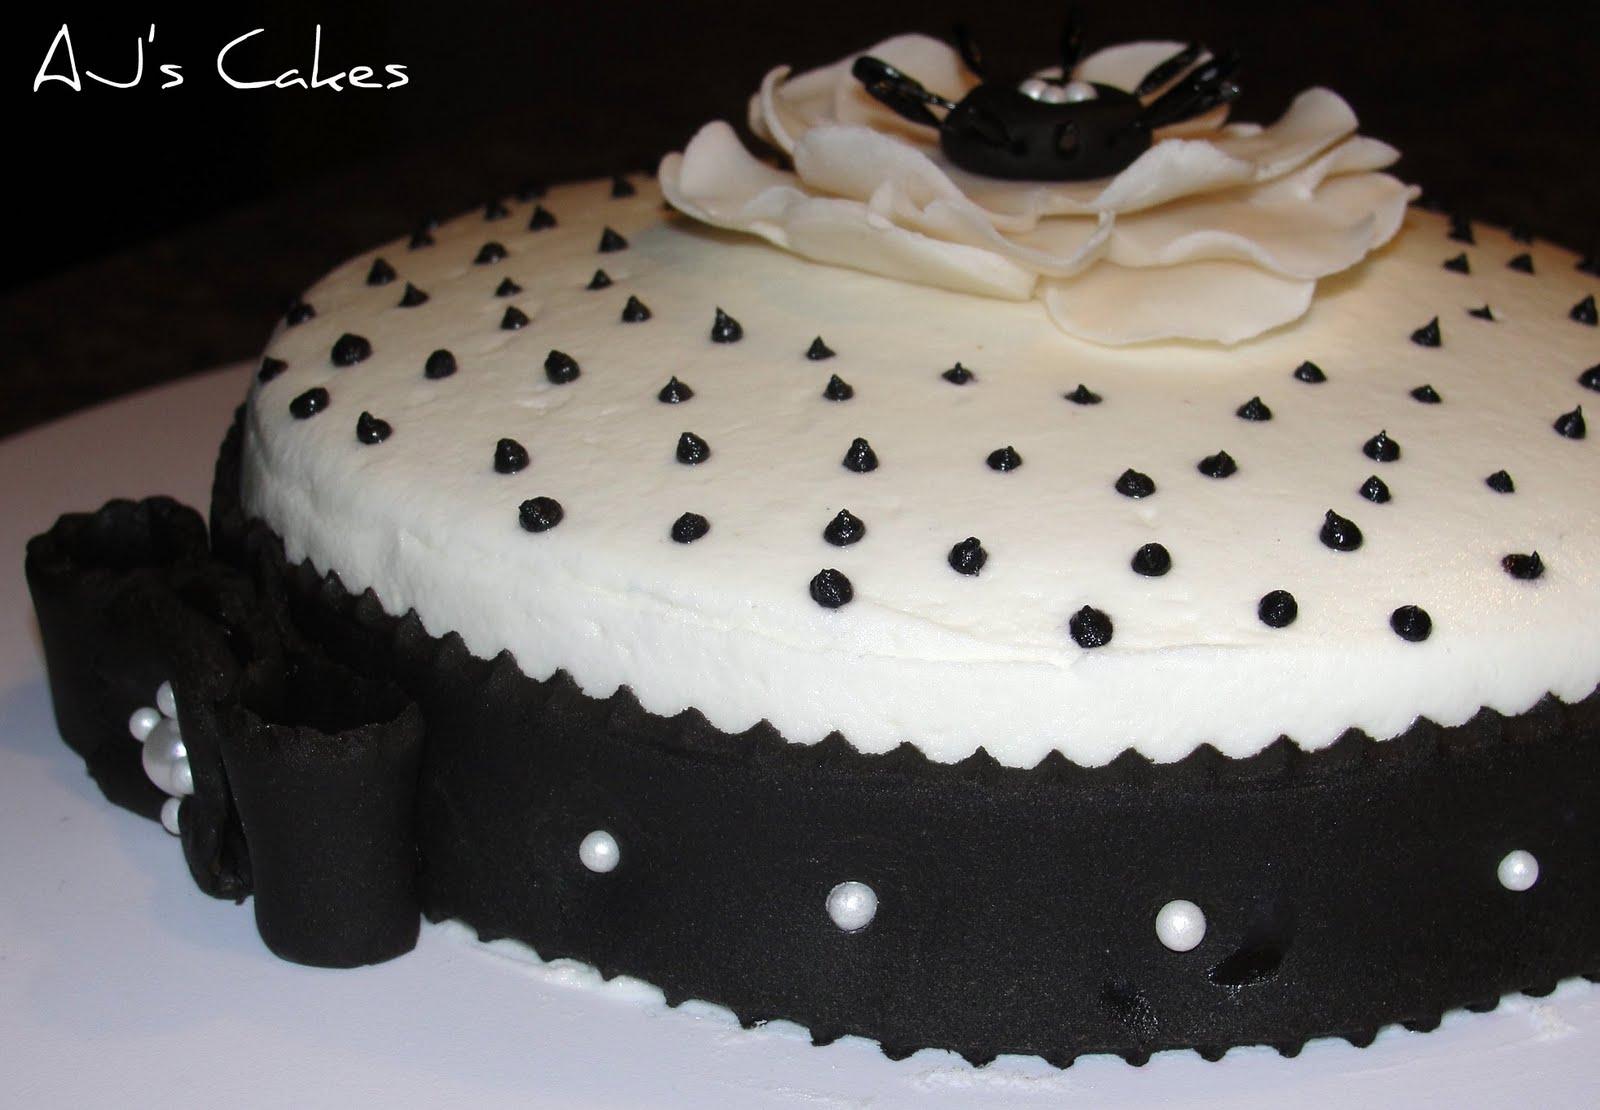 AJ's Cakes: Black and White Little Cake